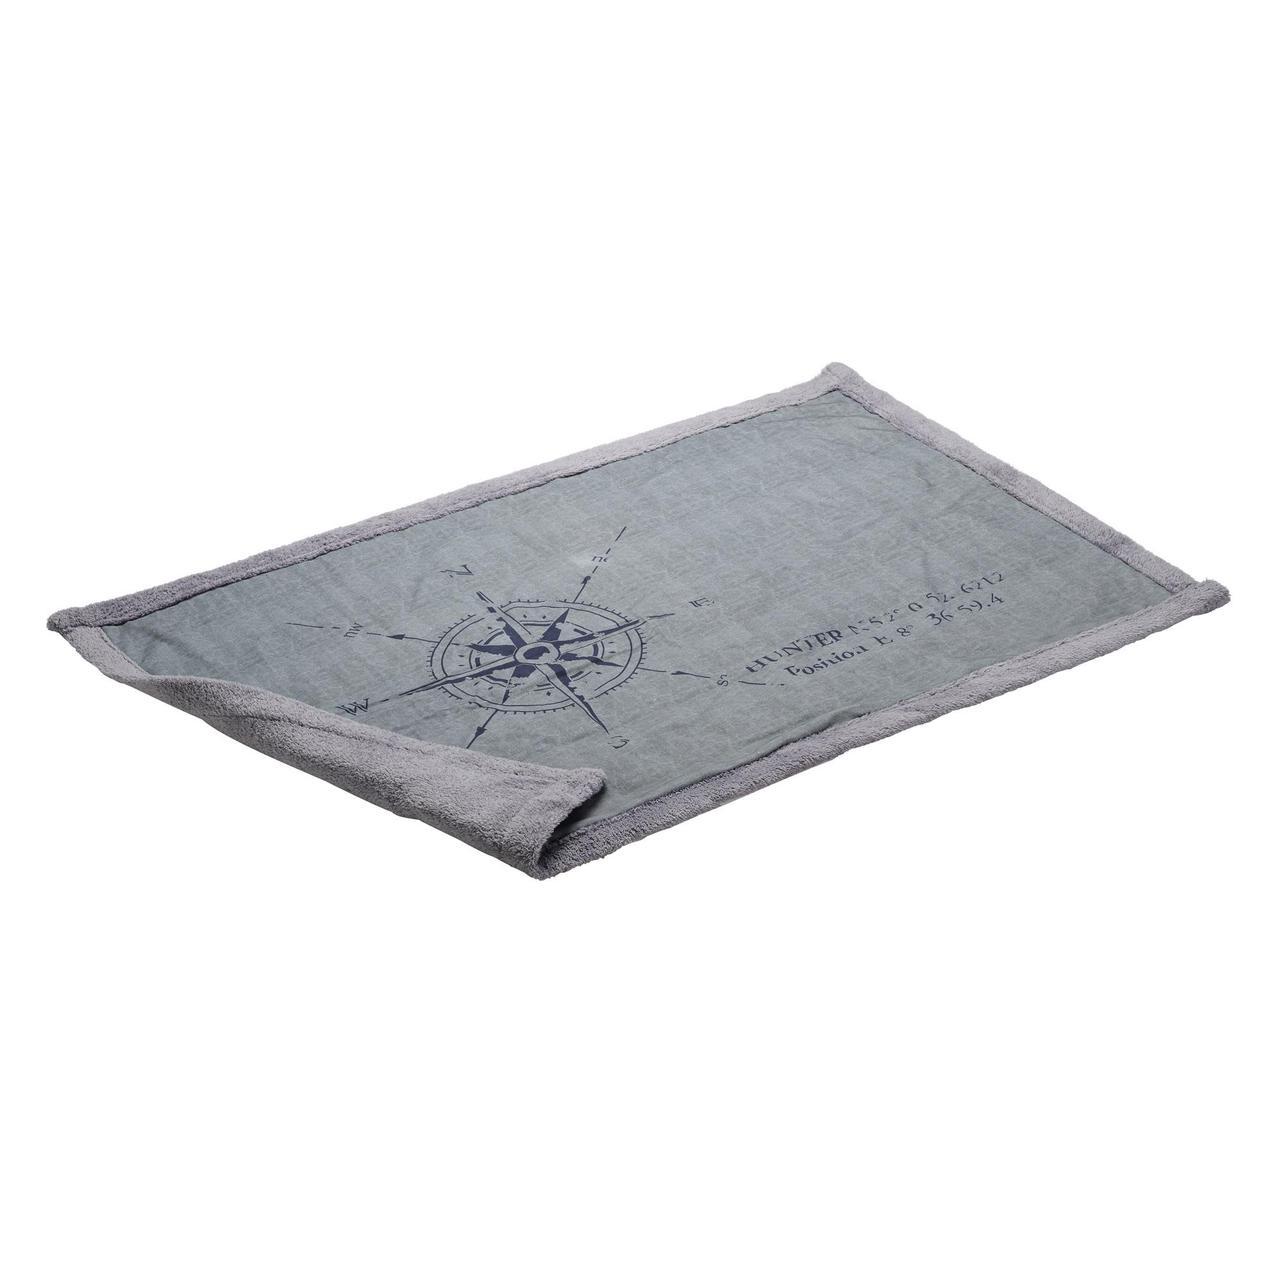 An image of Hunter Dog Blanket List 120 x 80cm